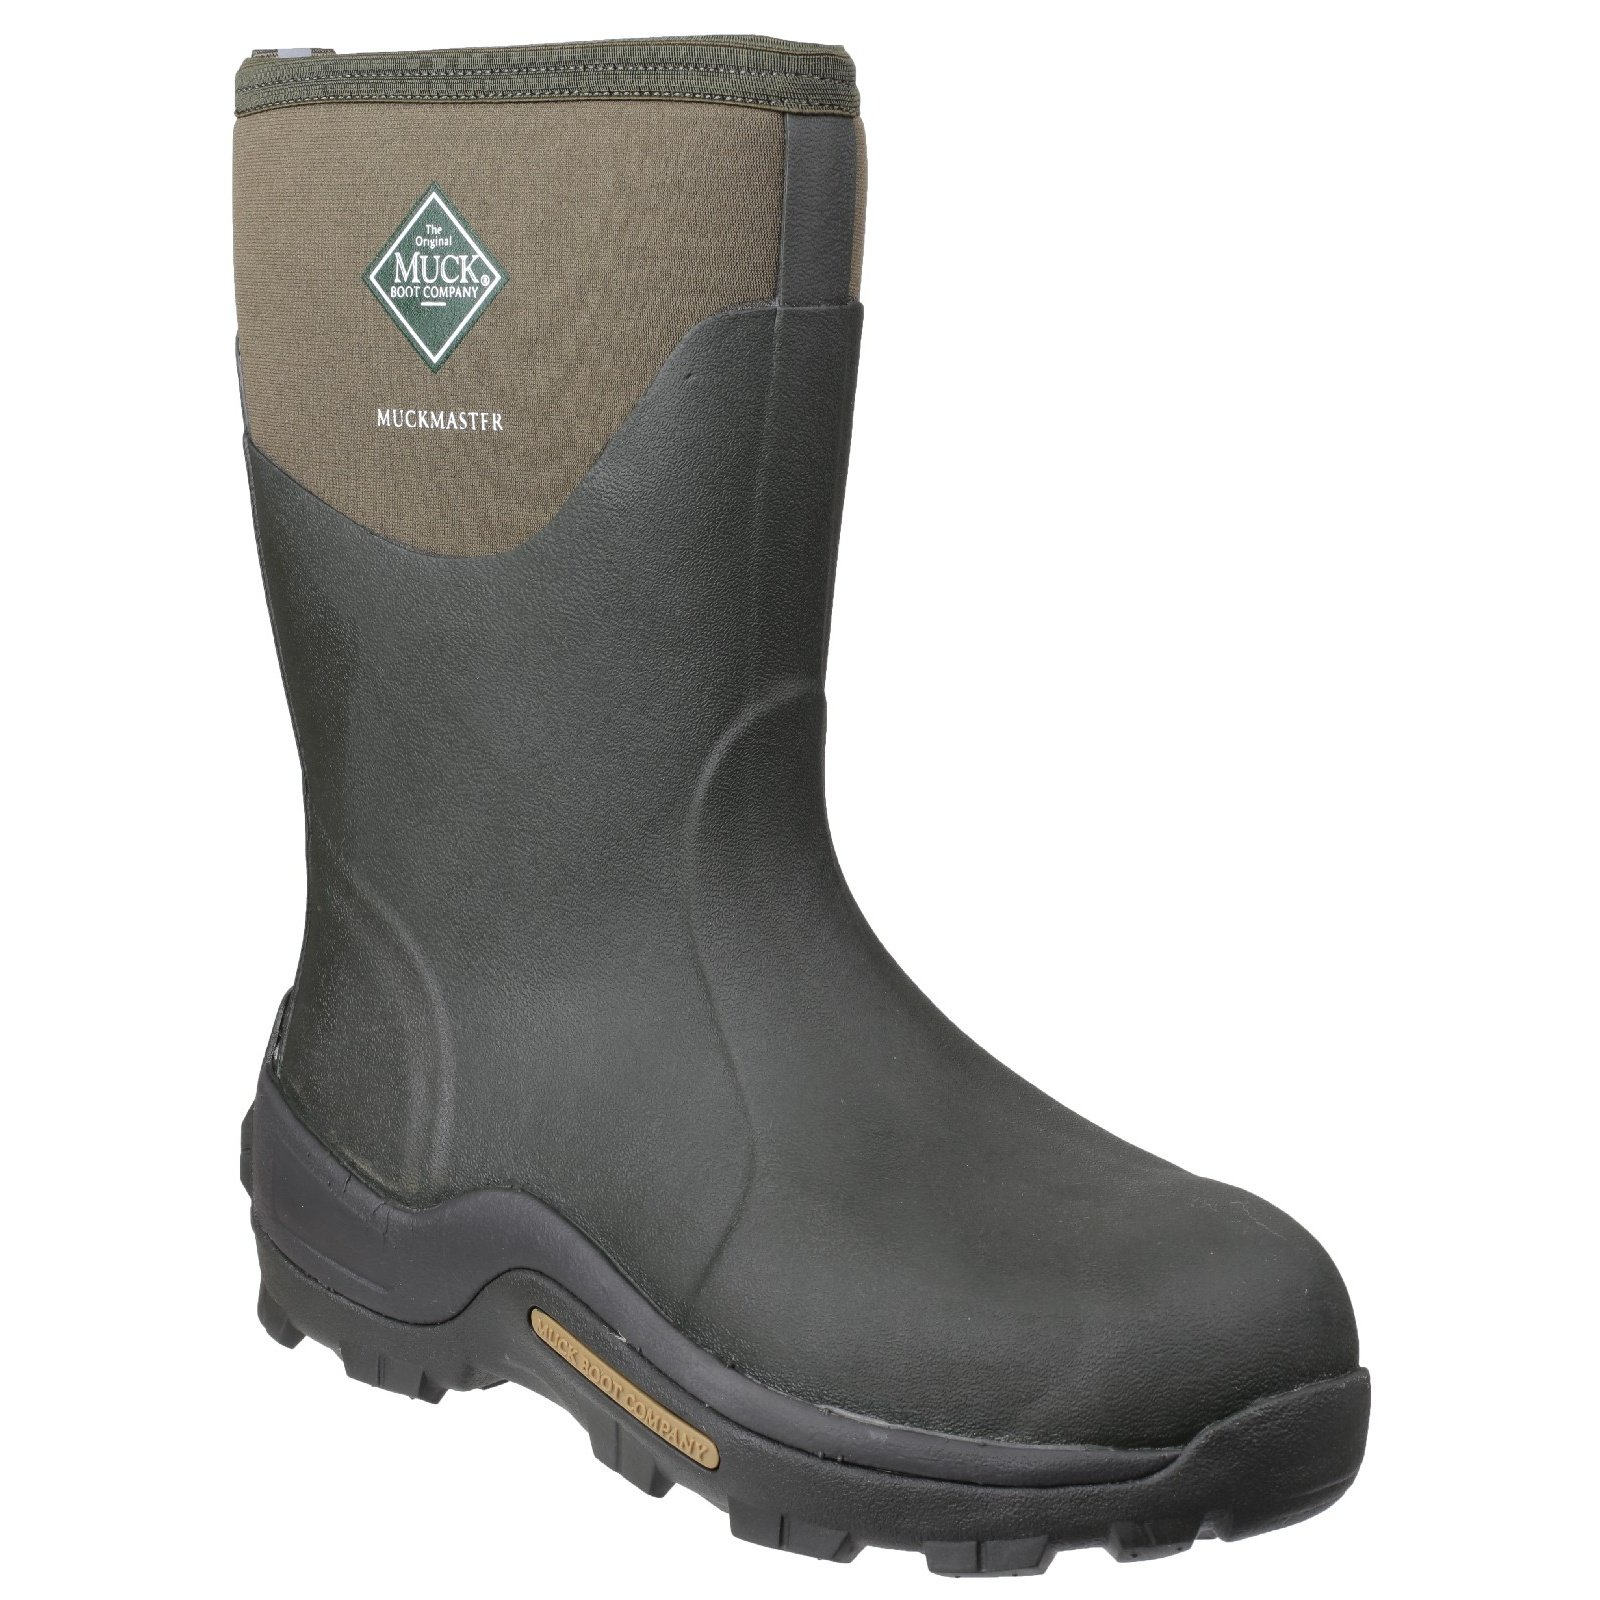 Muck Boot Unisex Muckmaster Hi Wellington Boots (8 M US / 9 W US) (Moss)